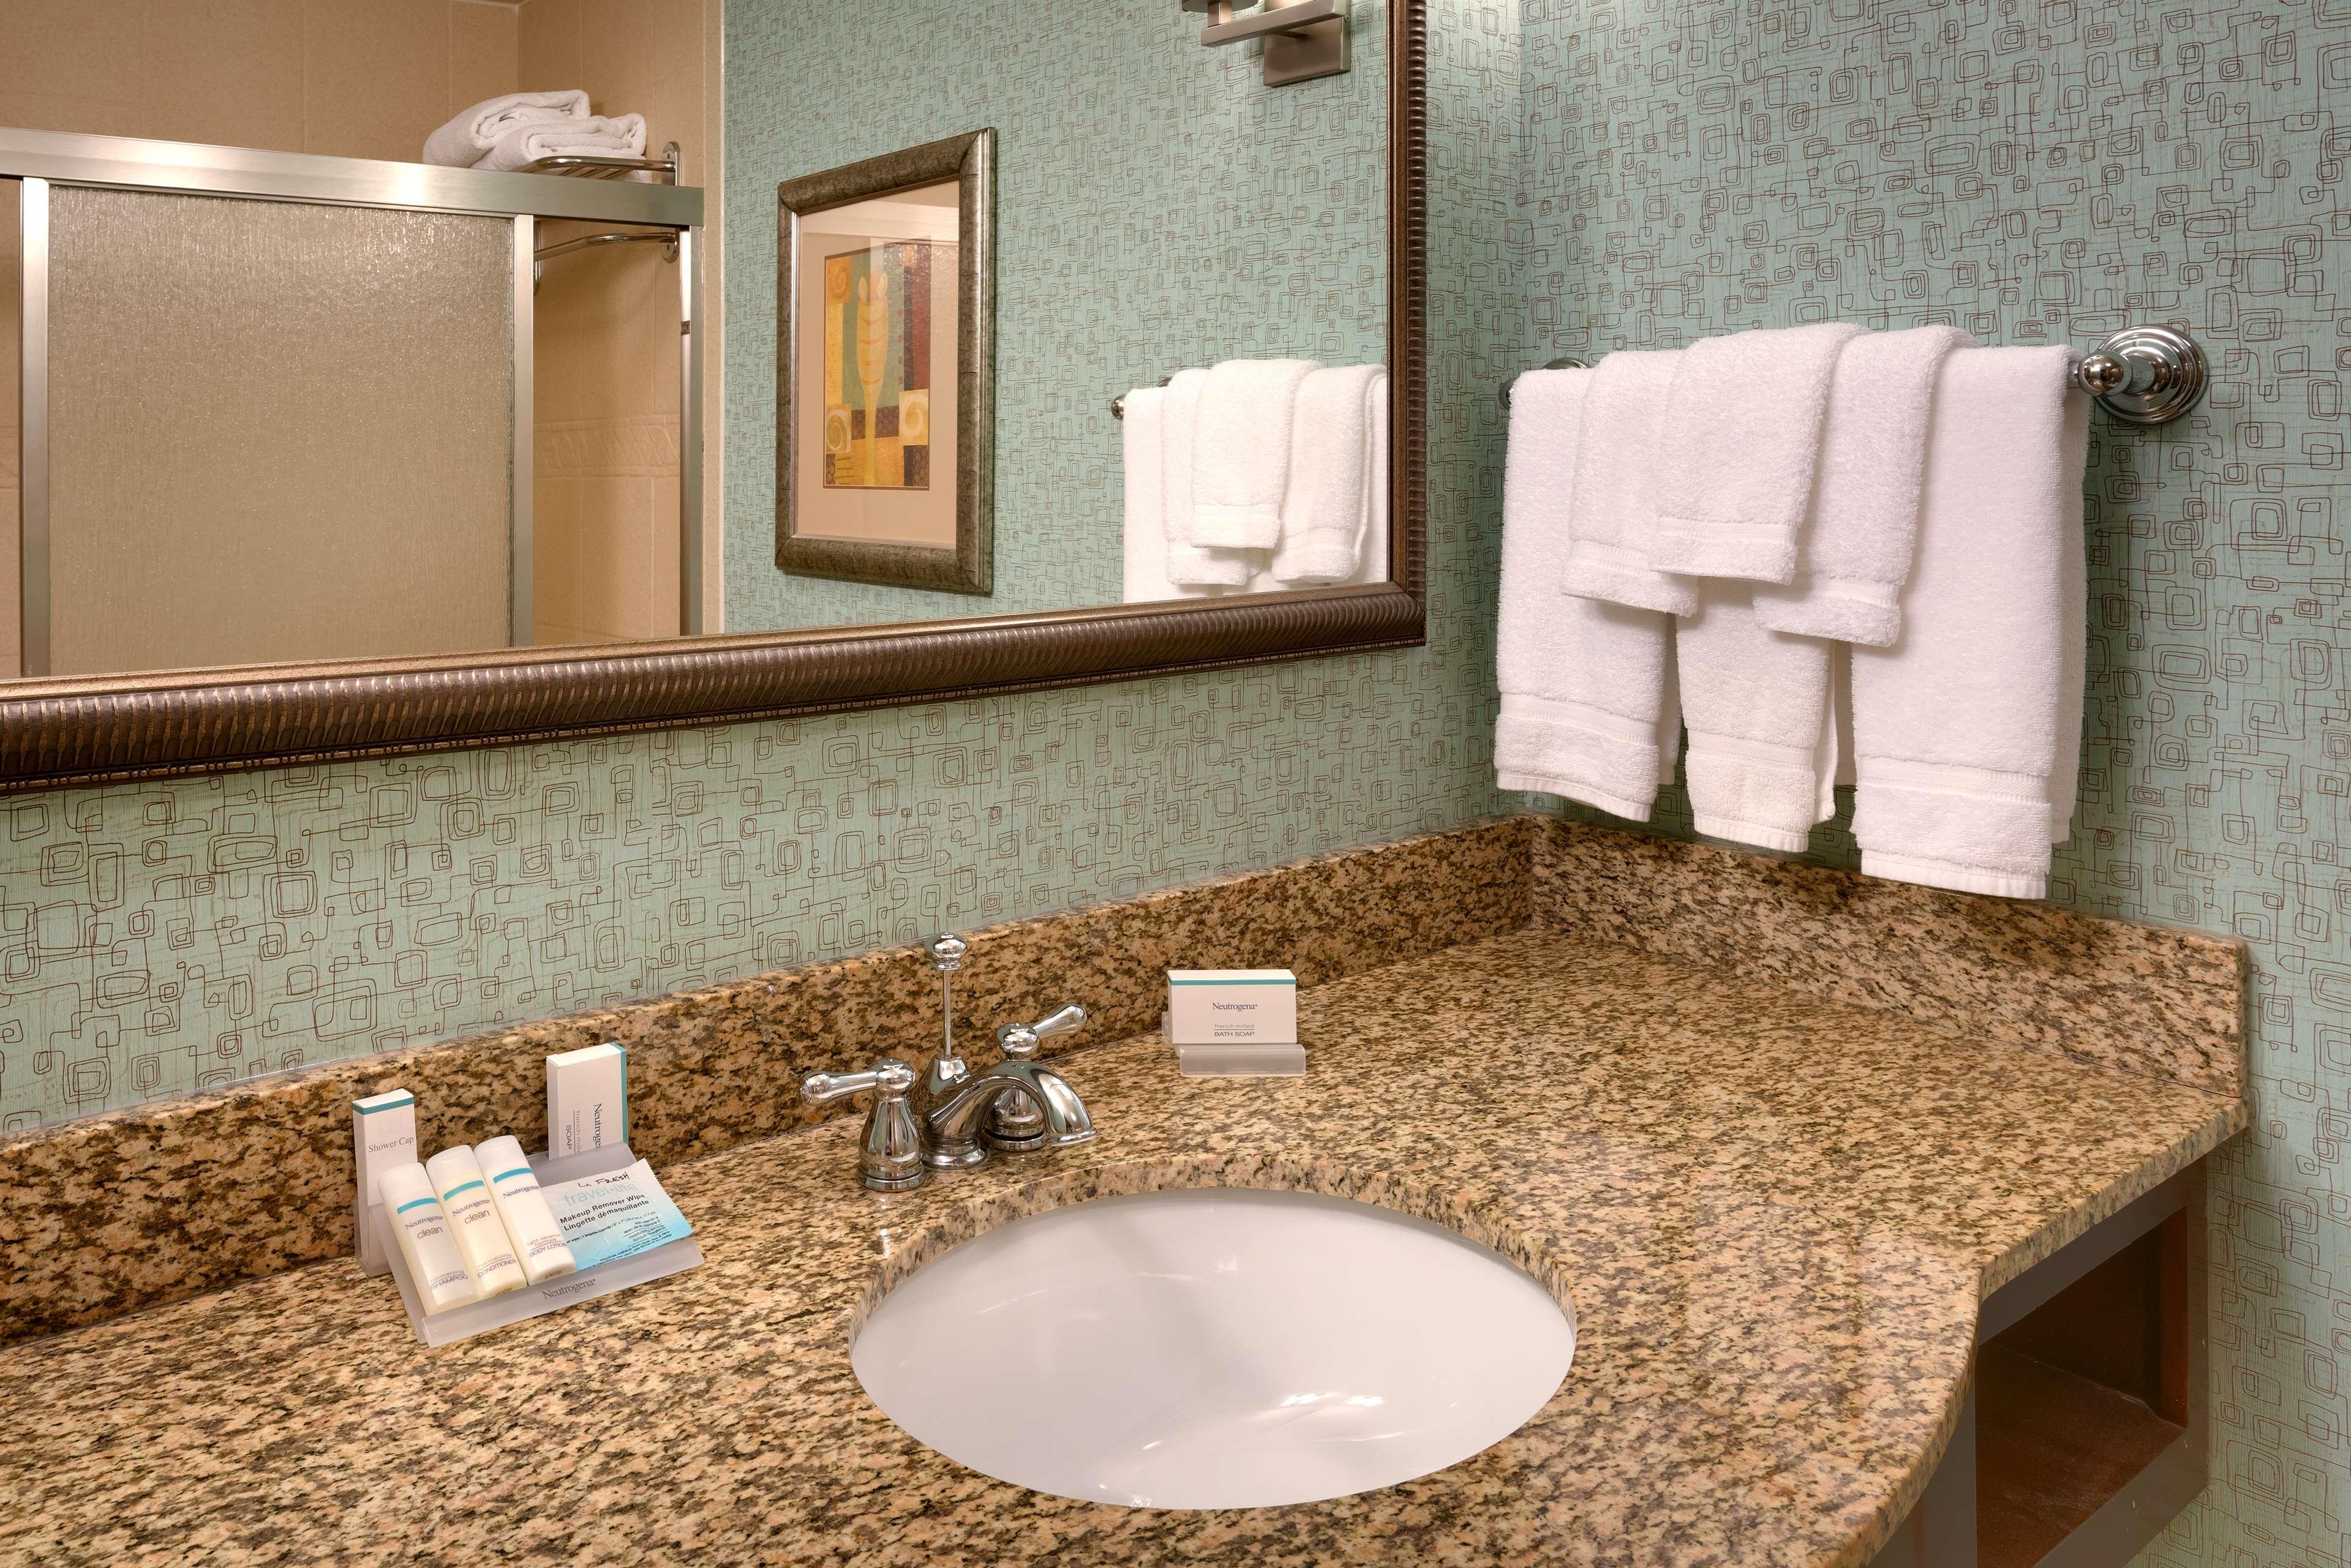 Hilton Garden Inn Clarksville image 17